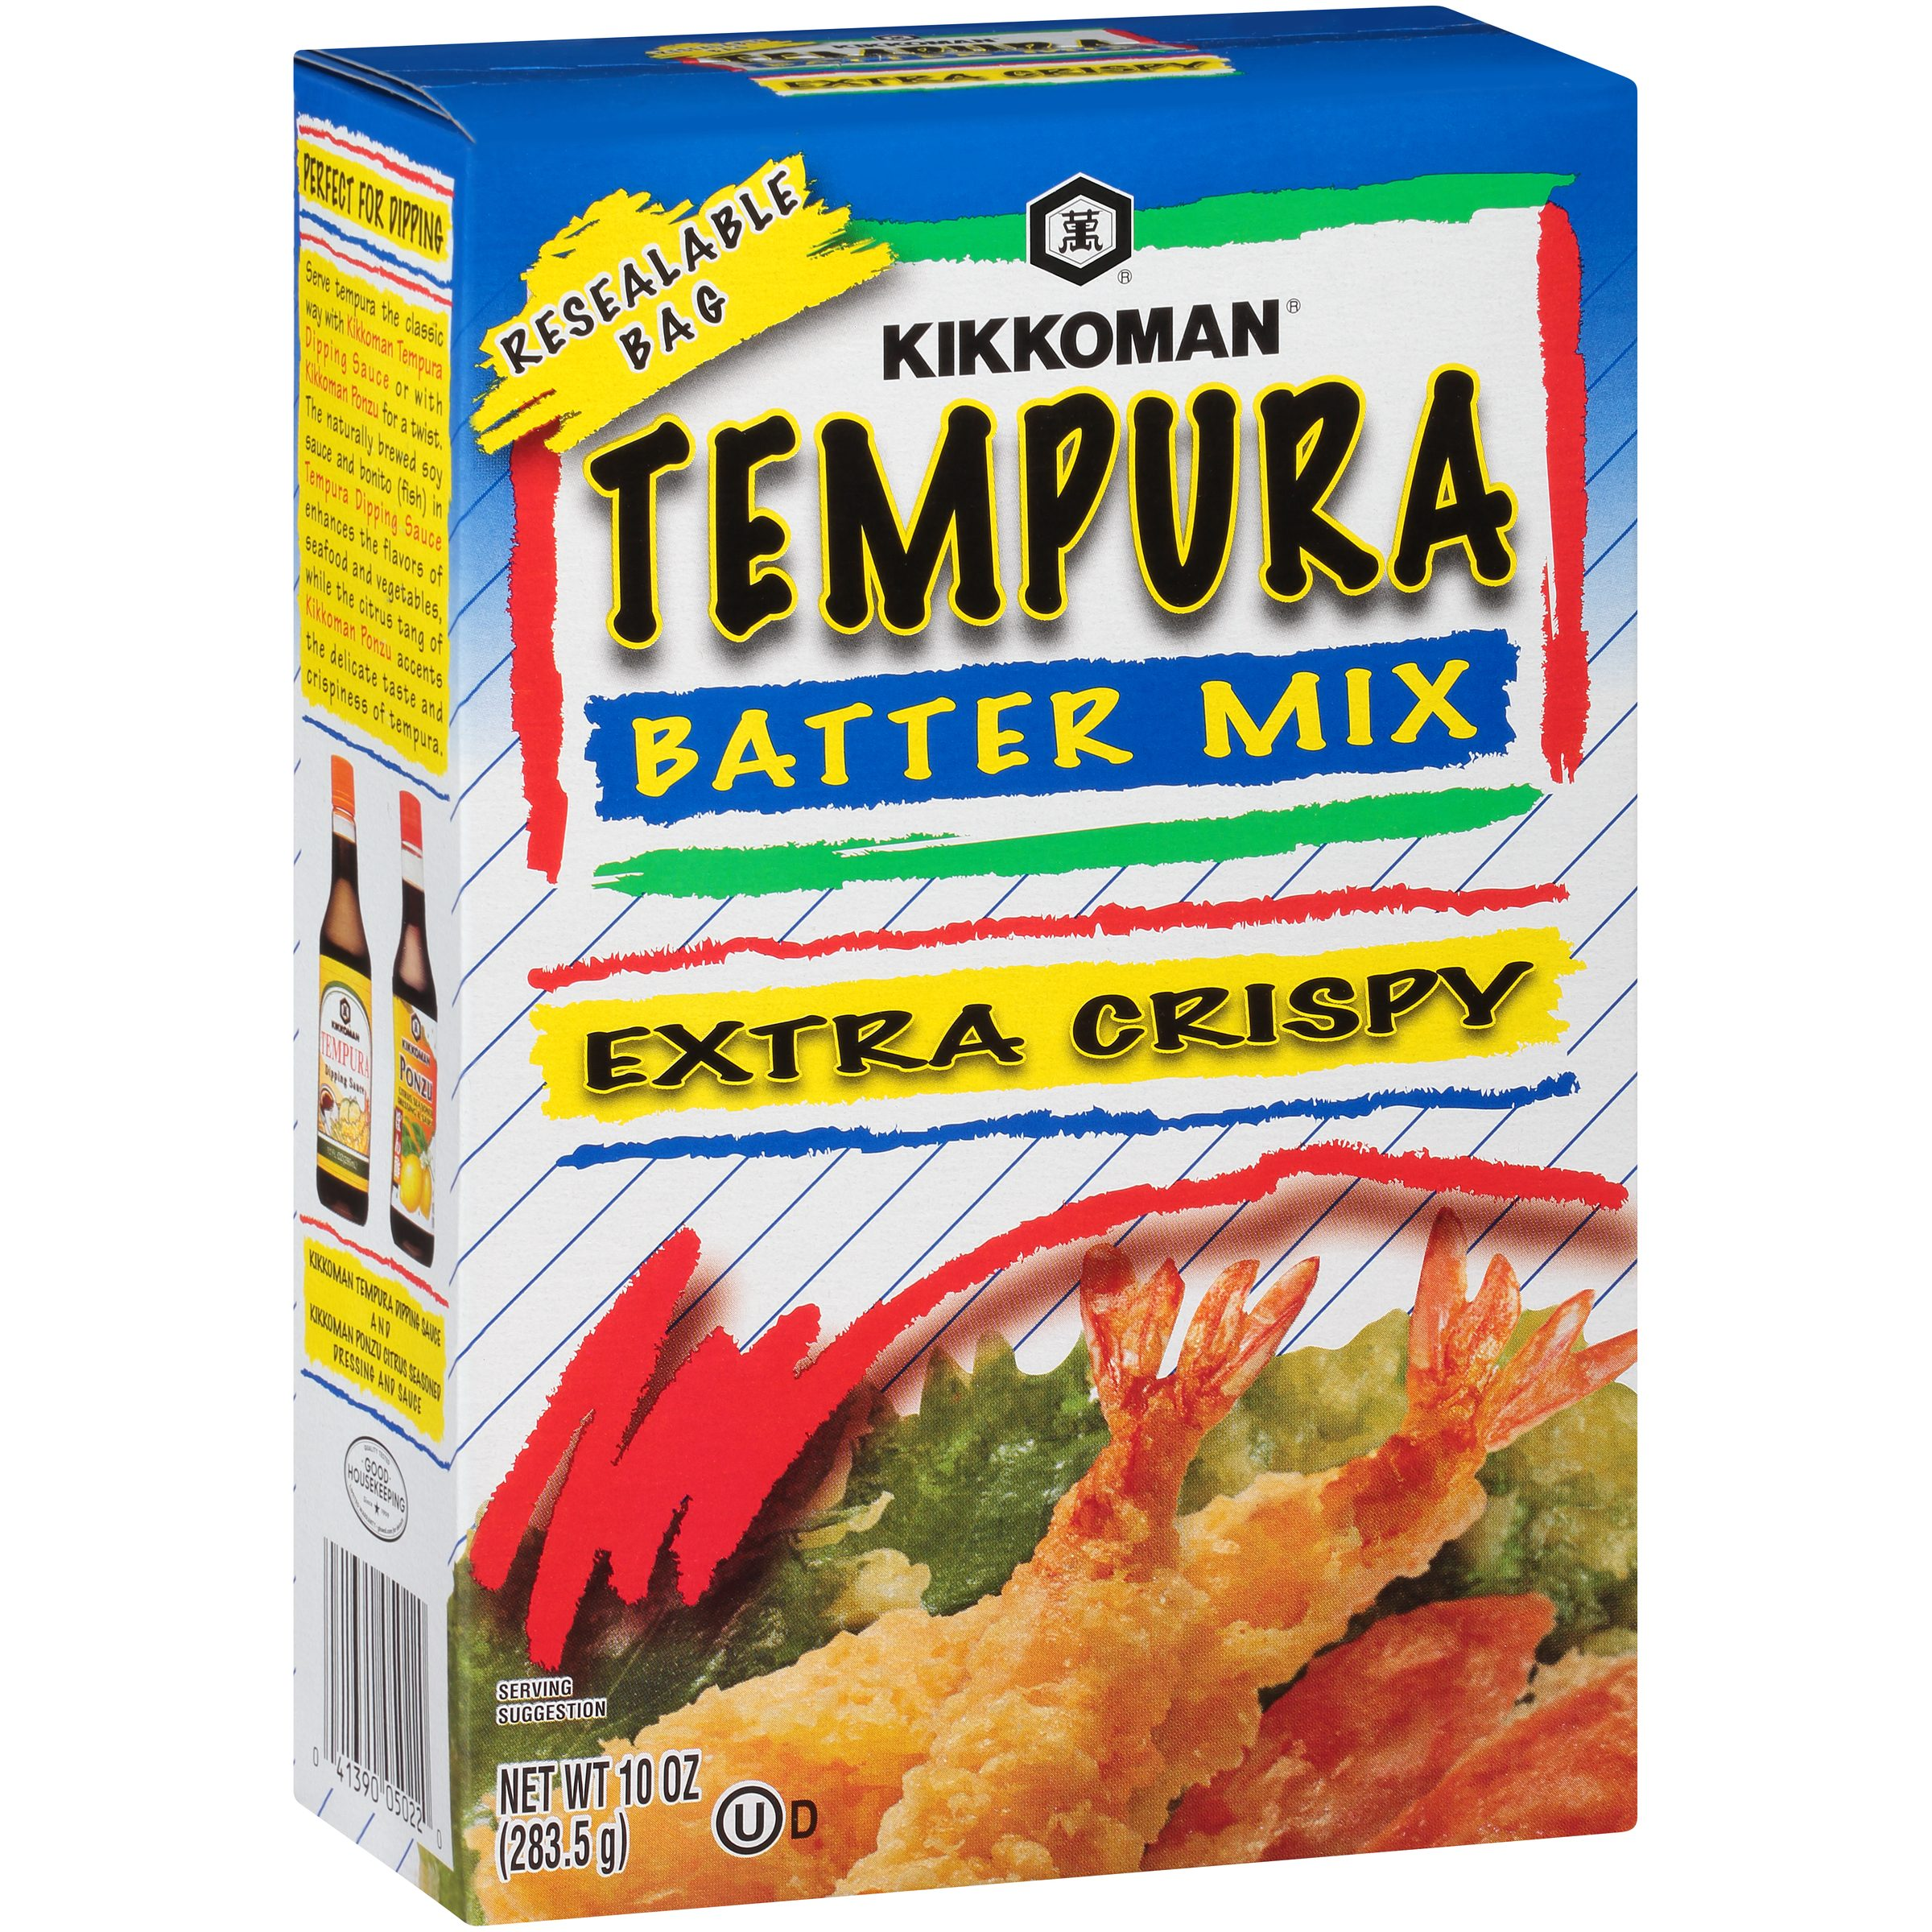 Kikkoman Extra Crispy Tempura Batter Mix 10 oz Box Walmart